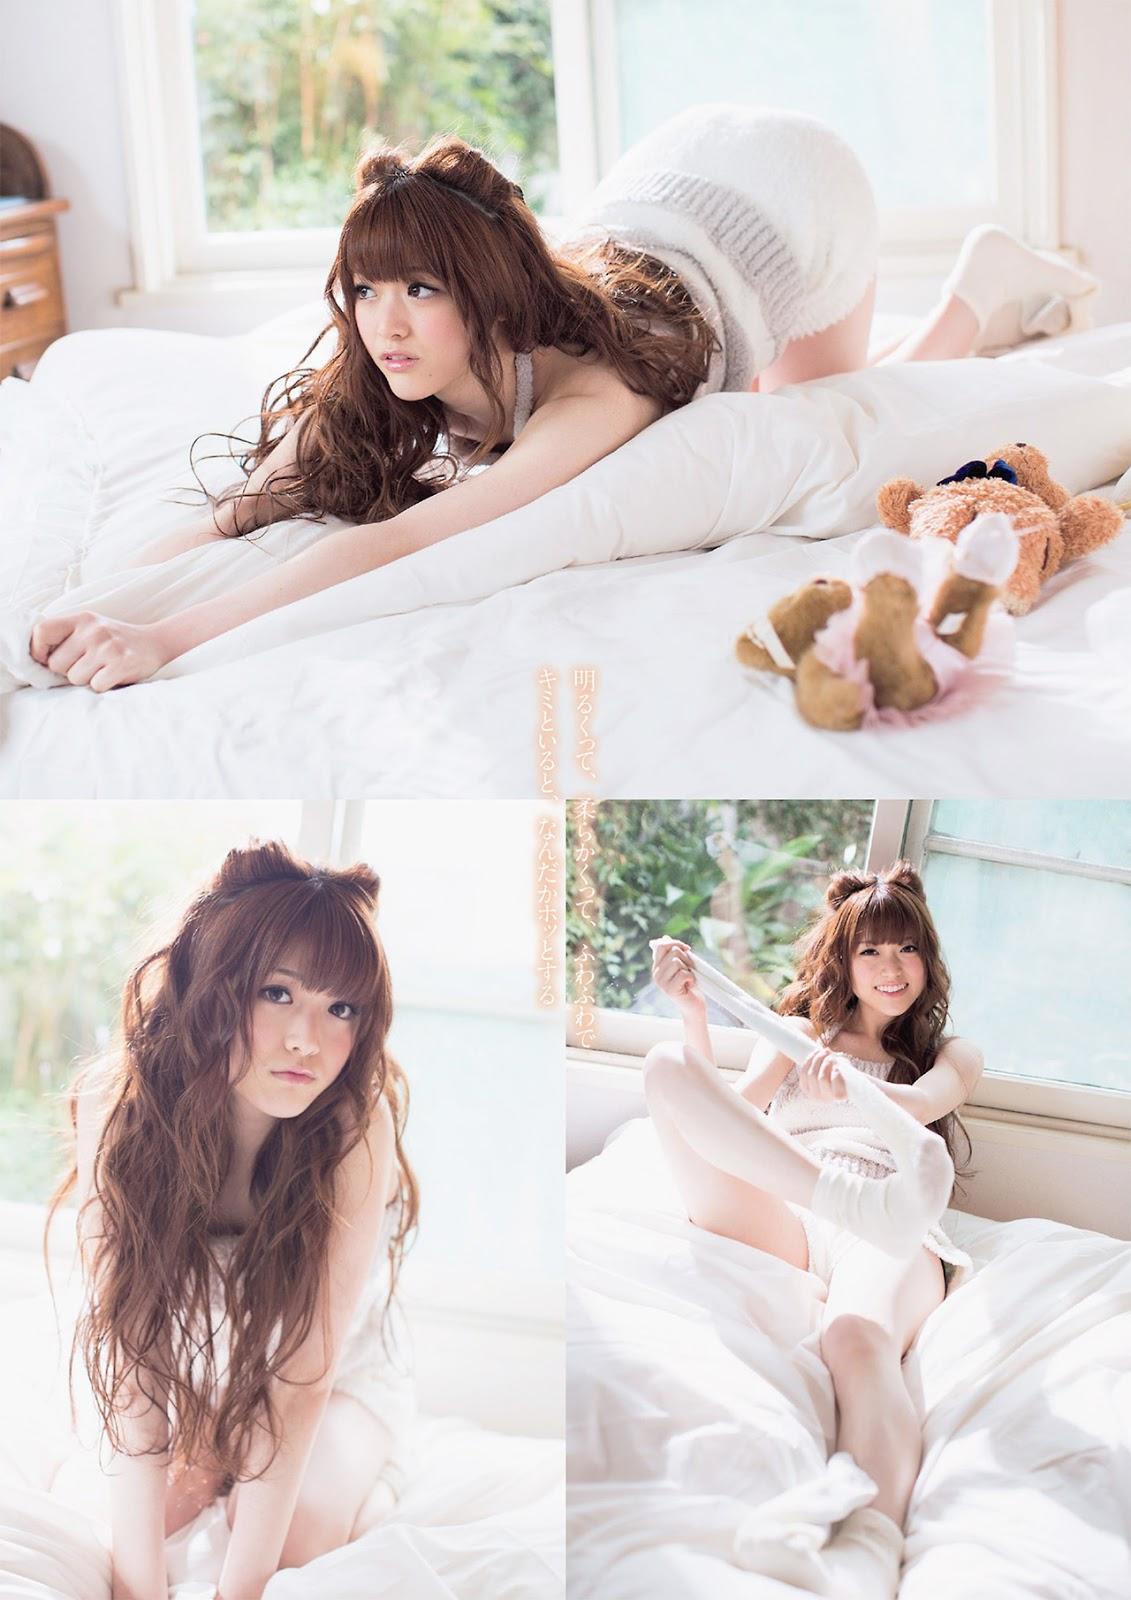 Nogizaka46+Sayuri+Matsumura+Hot+Royal+Ml